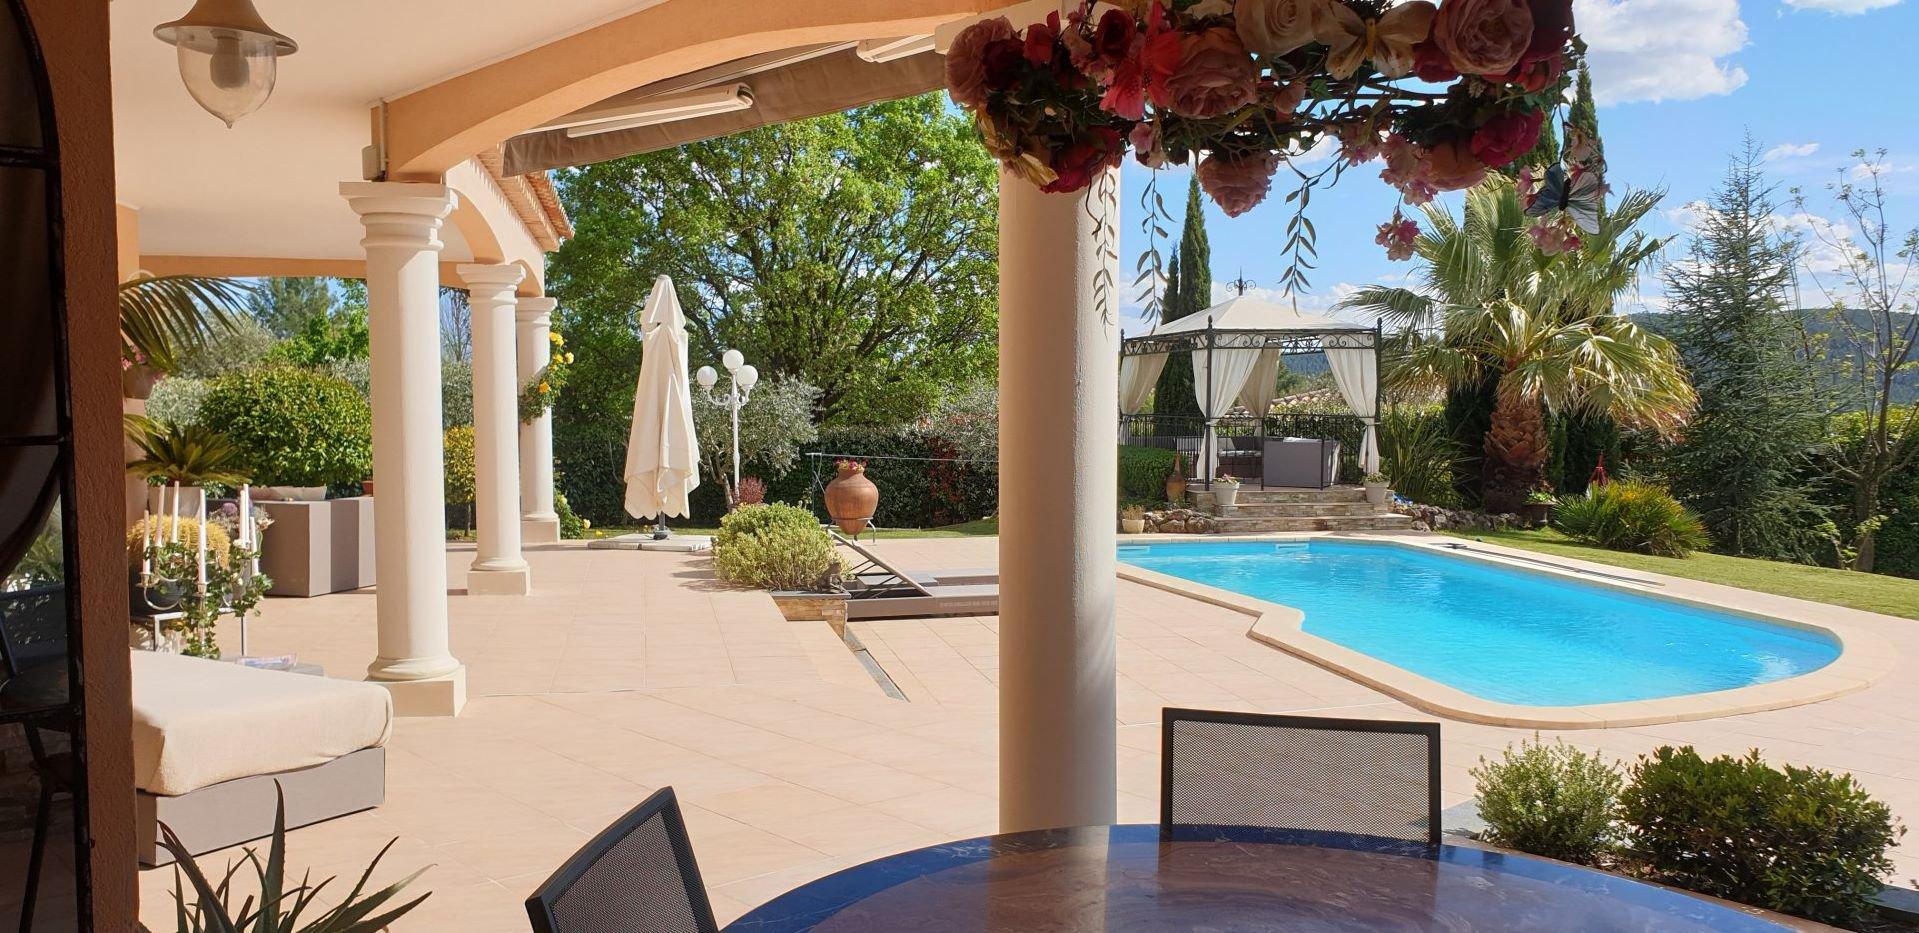 EXCLUSIVITY, elegant recent villa in a picturesque environment !